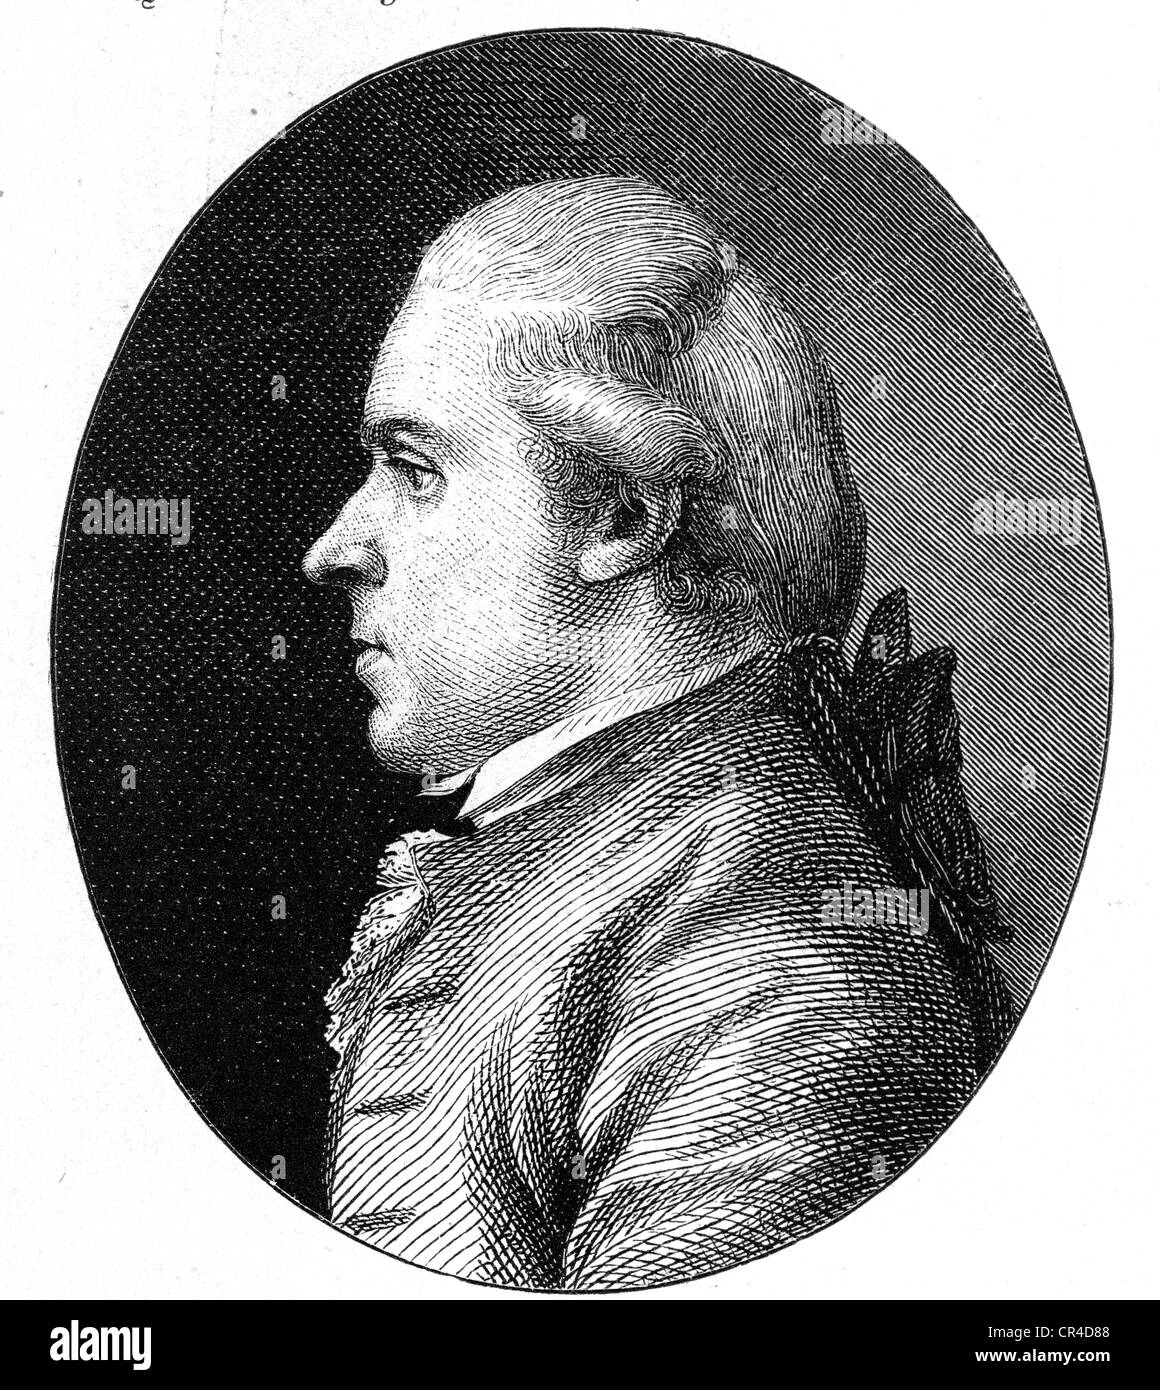 Johann Anton Leisewitz (1752-1806), writer, jurist - Stock Image